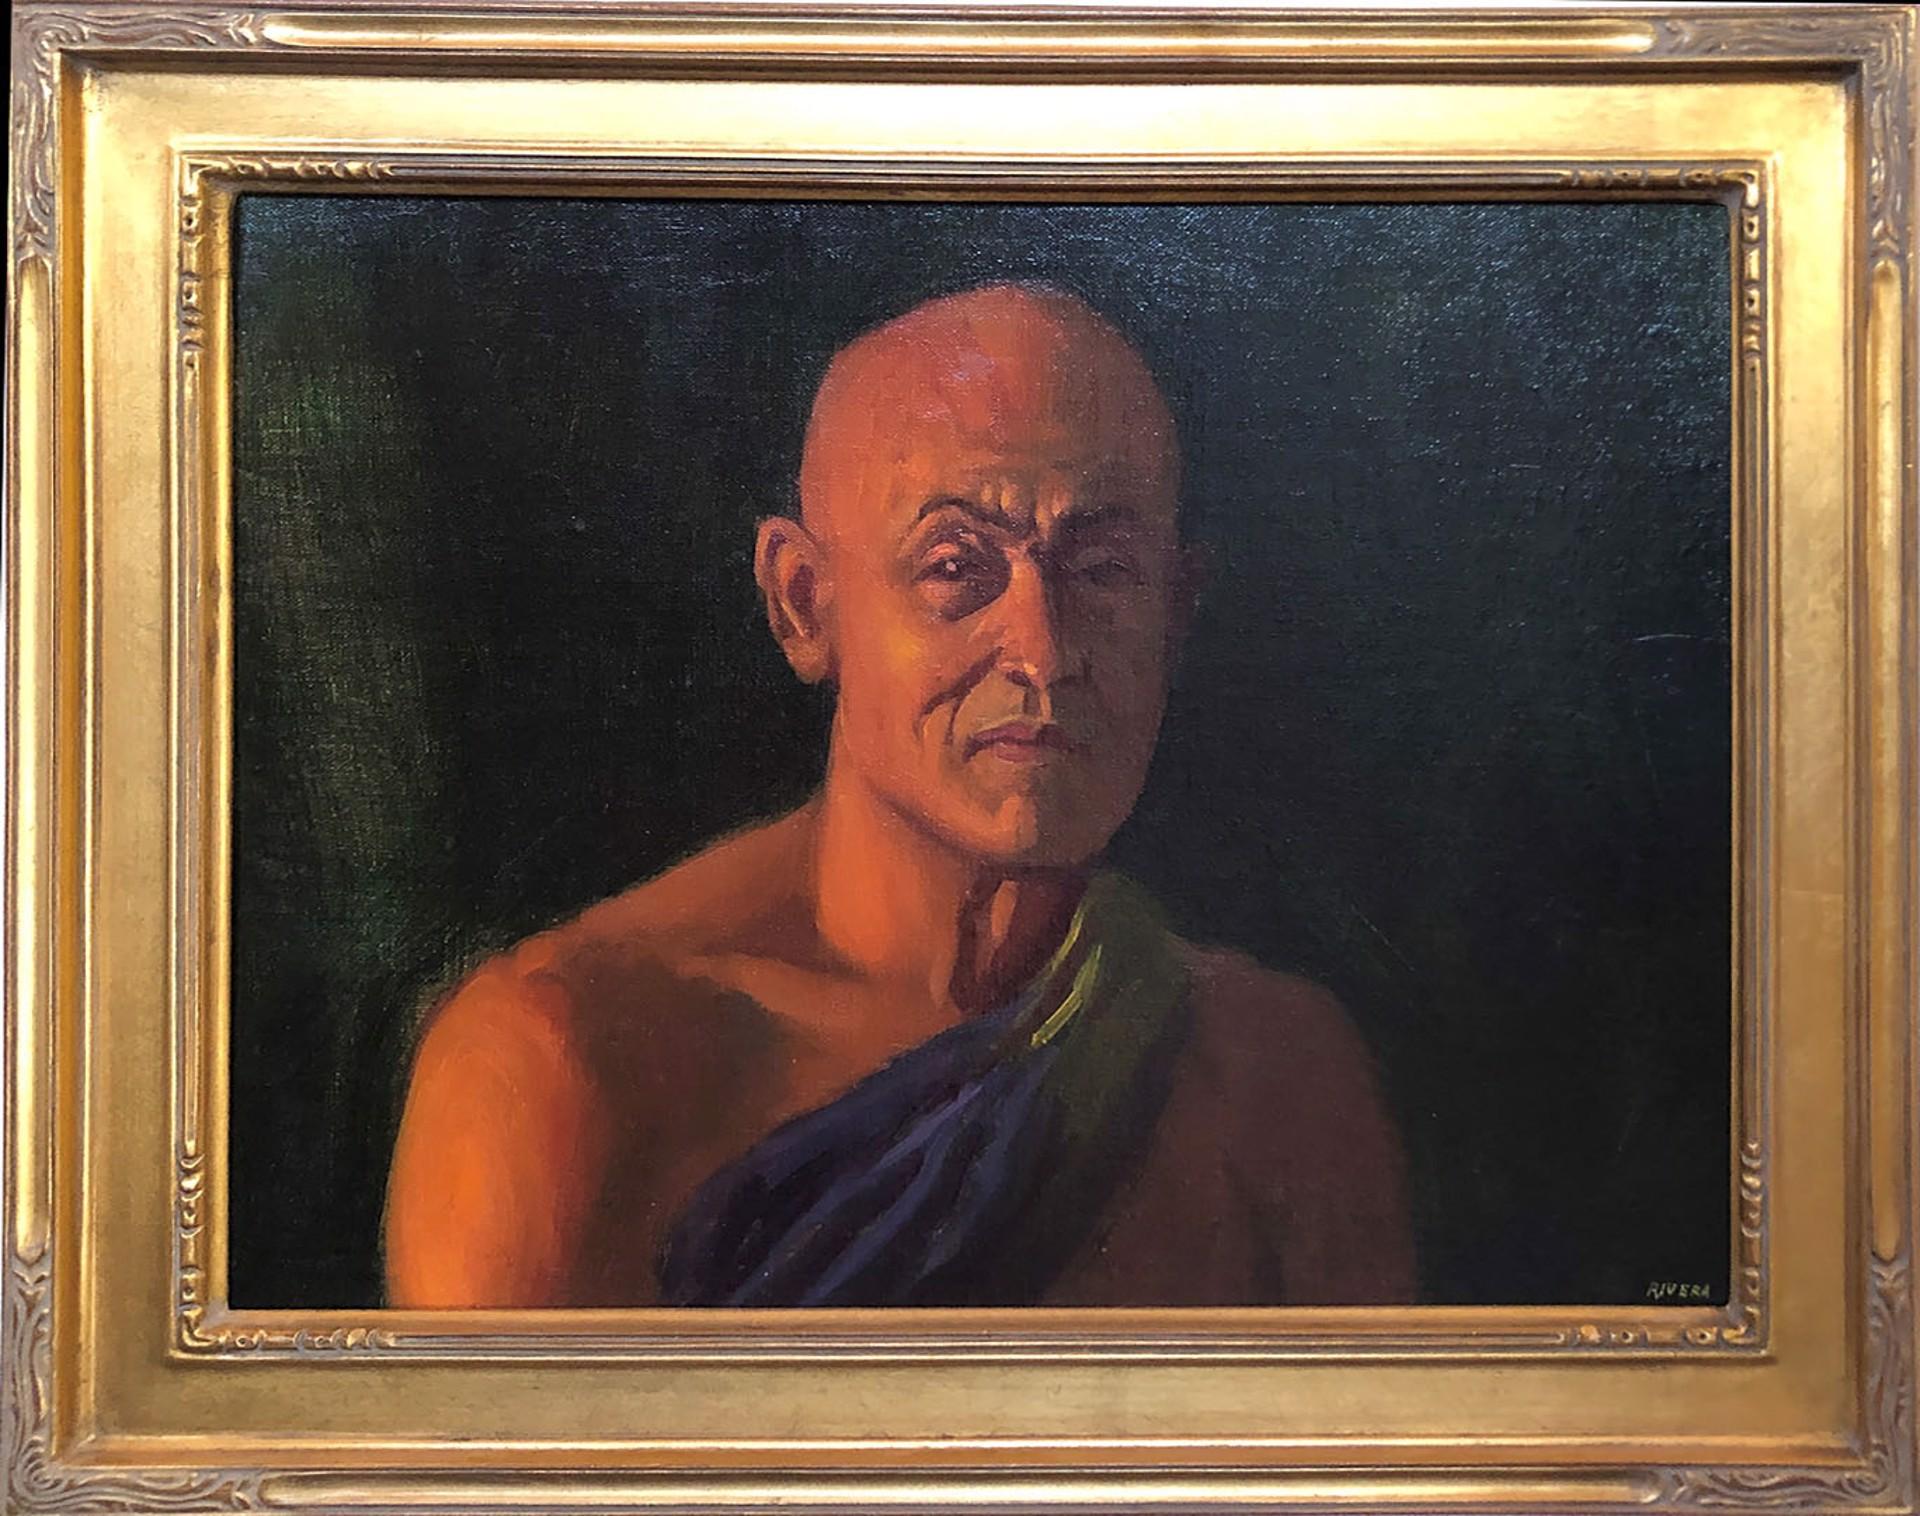 Tilakhana (The Three Marks of Existence) by Elias Rivera